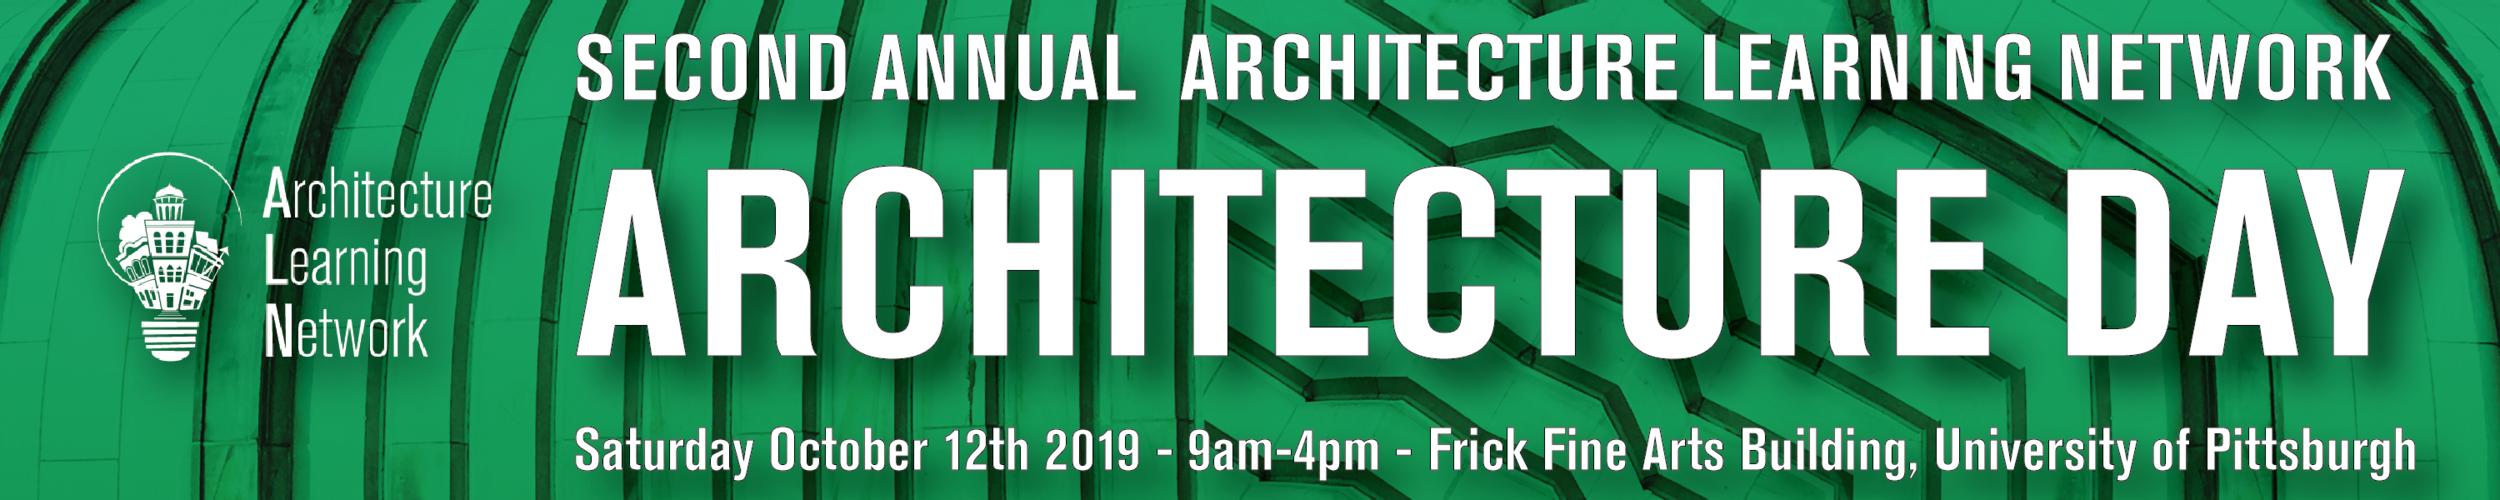 ArchitectureDay2019-banner-04.png